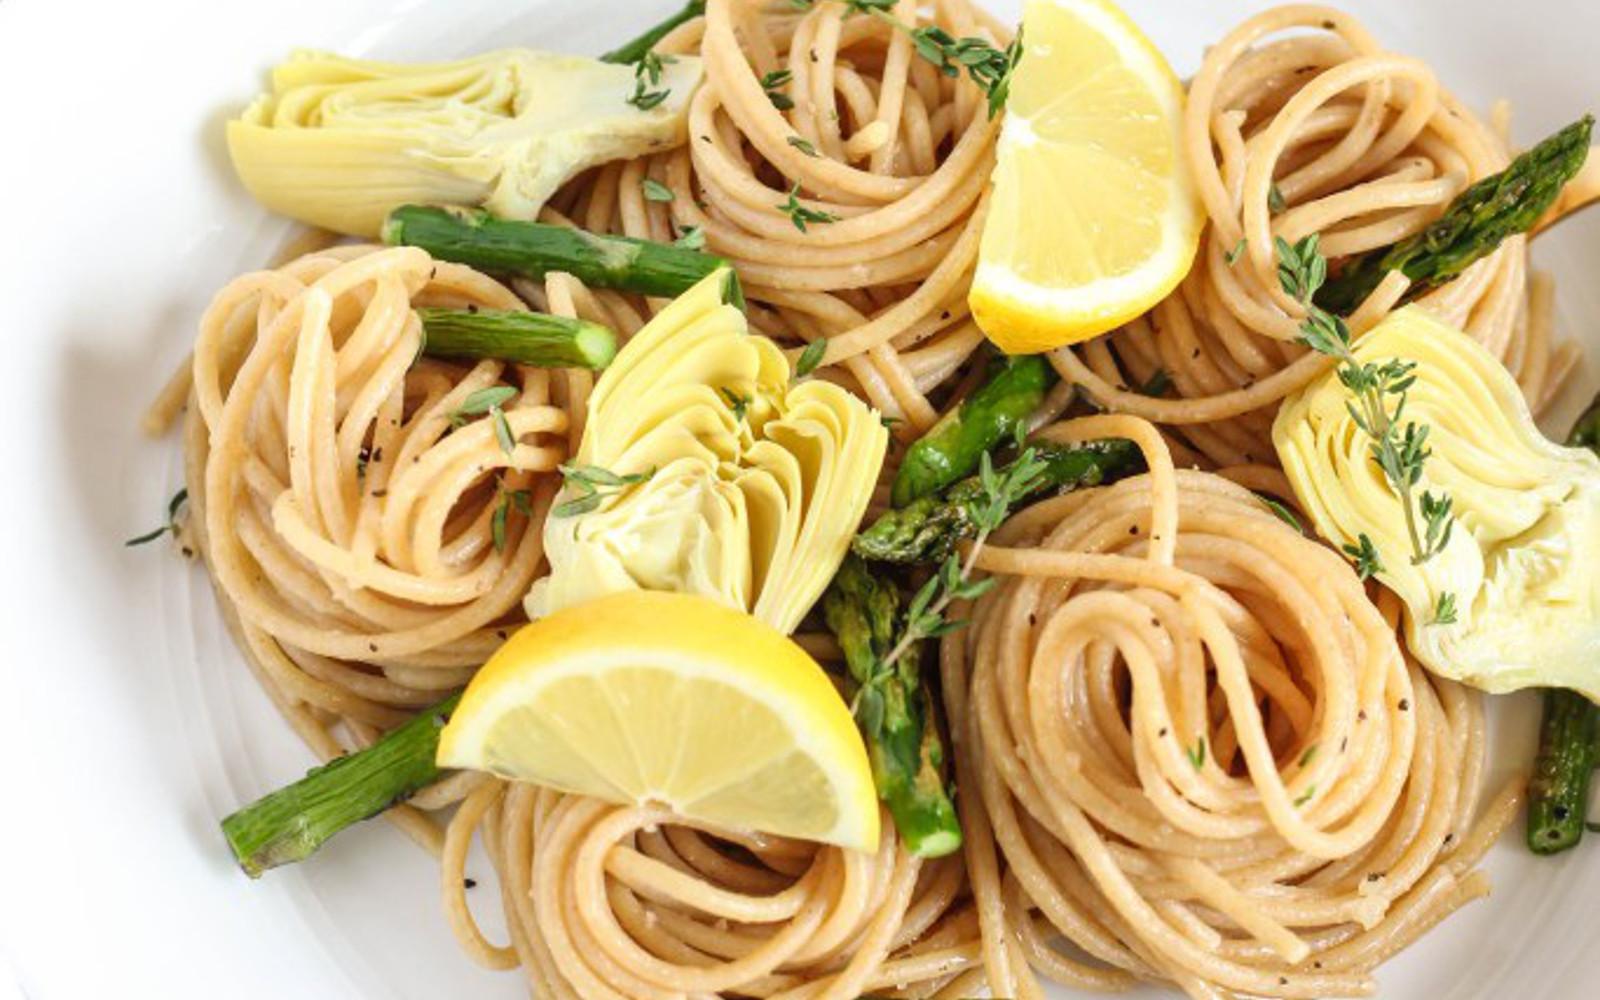 Vegan Gluten-free Garlic Asparagus Artichoke Pasta with fresh lemon